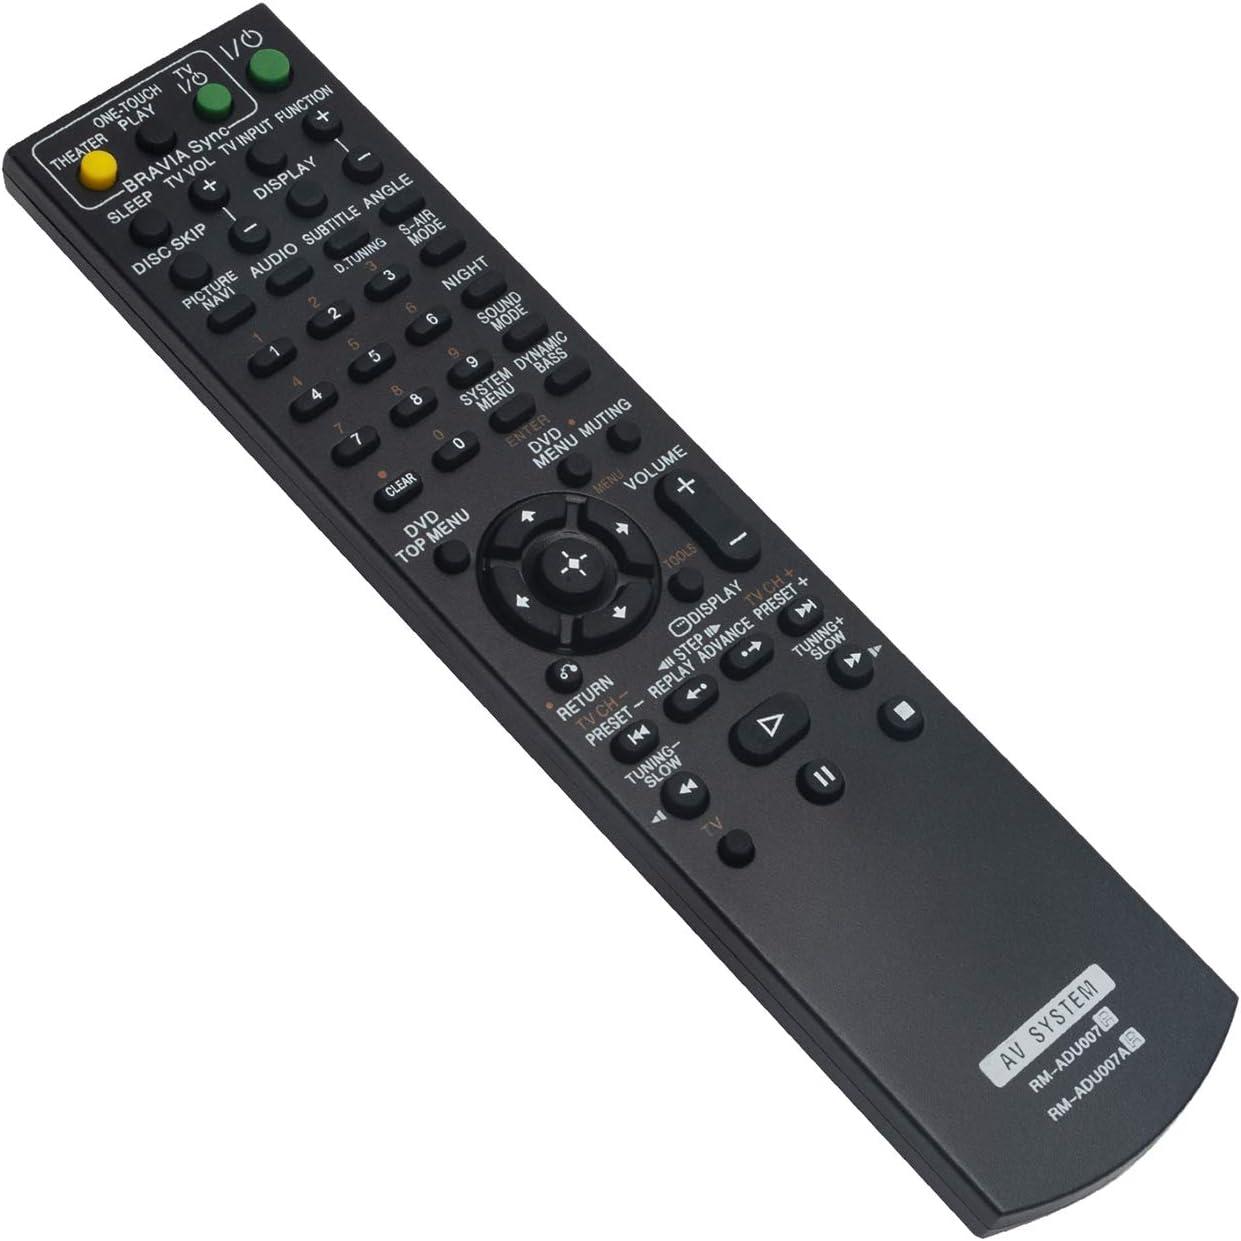 RM-ADU007 RM-ADU007A Replace Remote Control fit for Sony DVD Player Home Theater System DAV-HDX275 DAV-HDX276 DAV-HDX277WC DAV-HDX279W DAV-HDX285 DAV-HDX287WC DAV-HDX475 DAV-HDX576WF DAV-HDX585